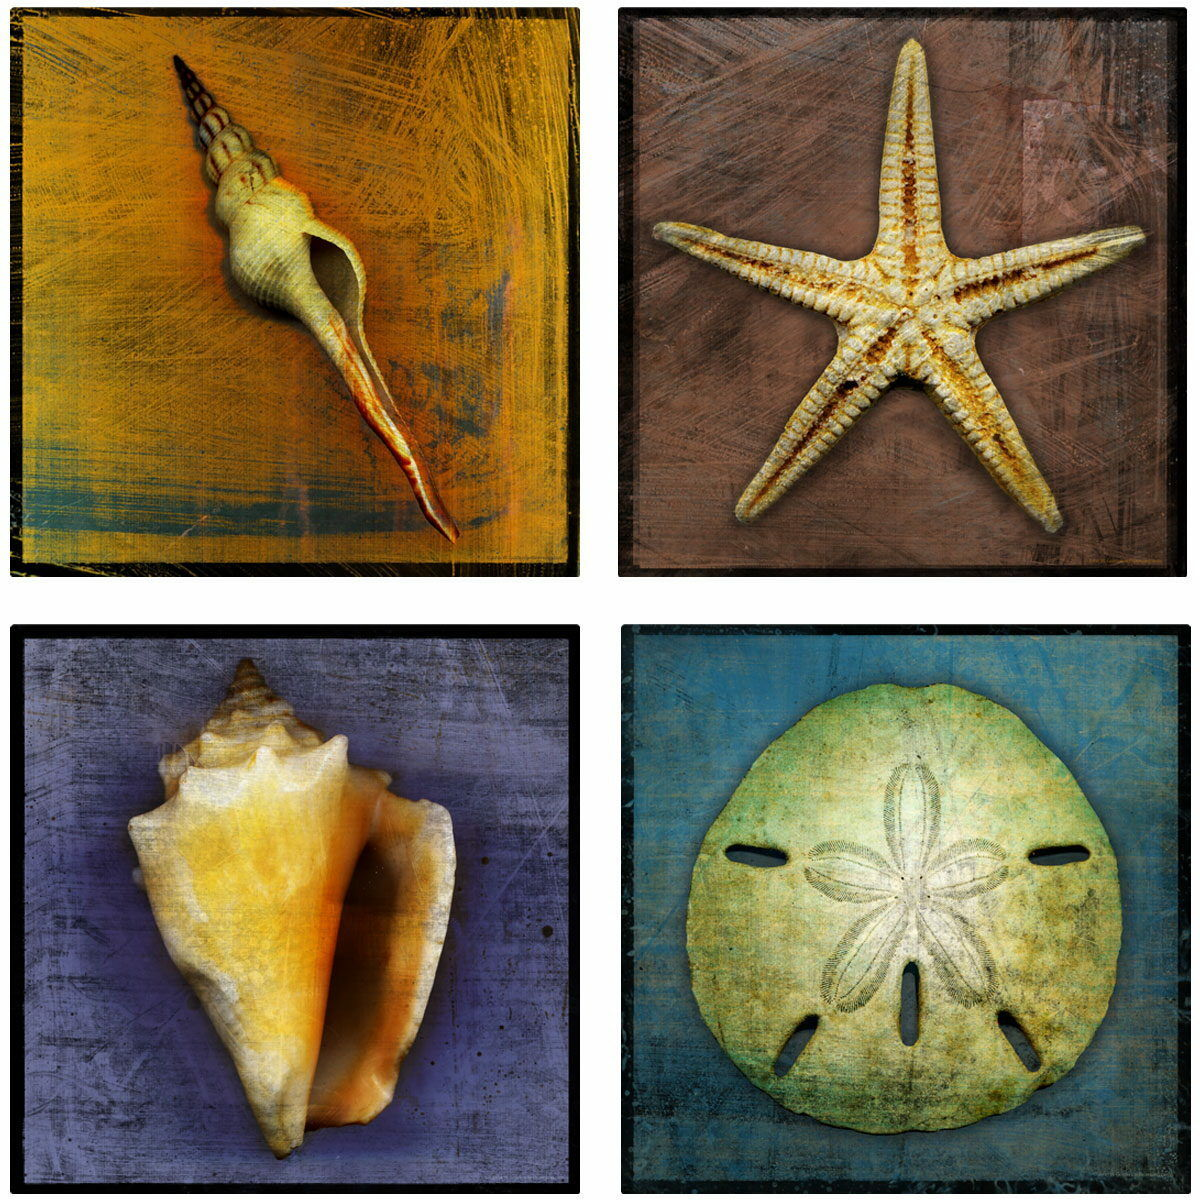 Starfish & Shells Ocean Wall Decal Set Bathroom Decor Vintage Style 12 x 12